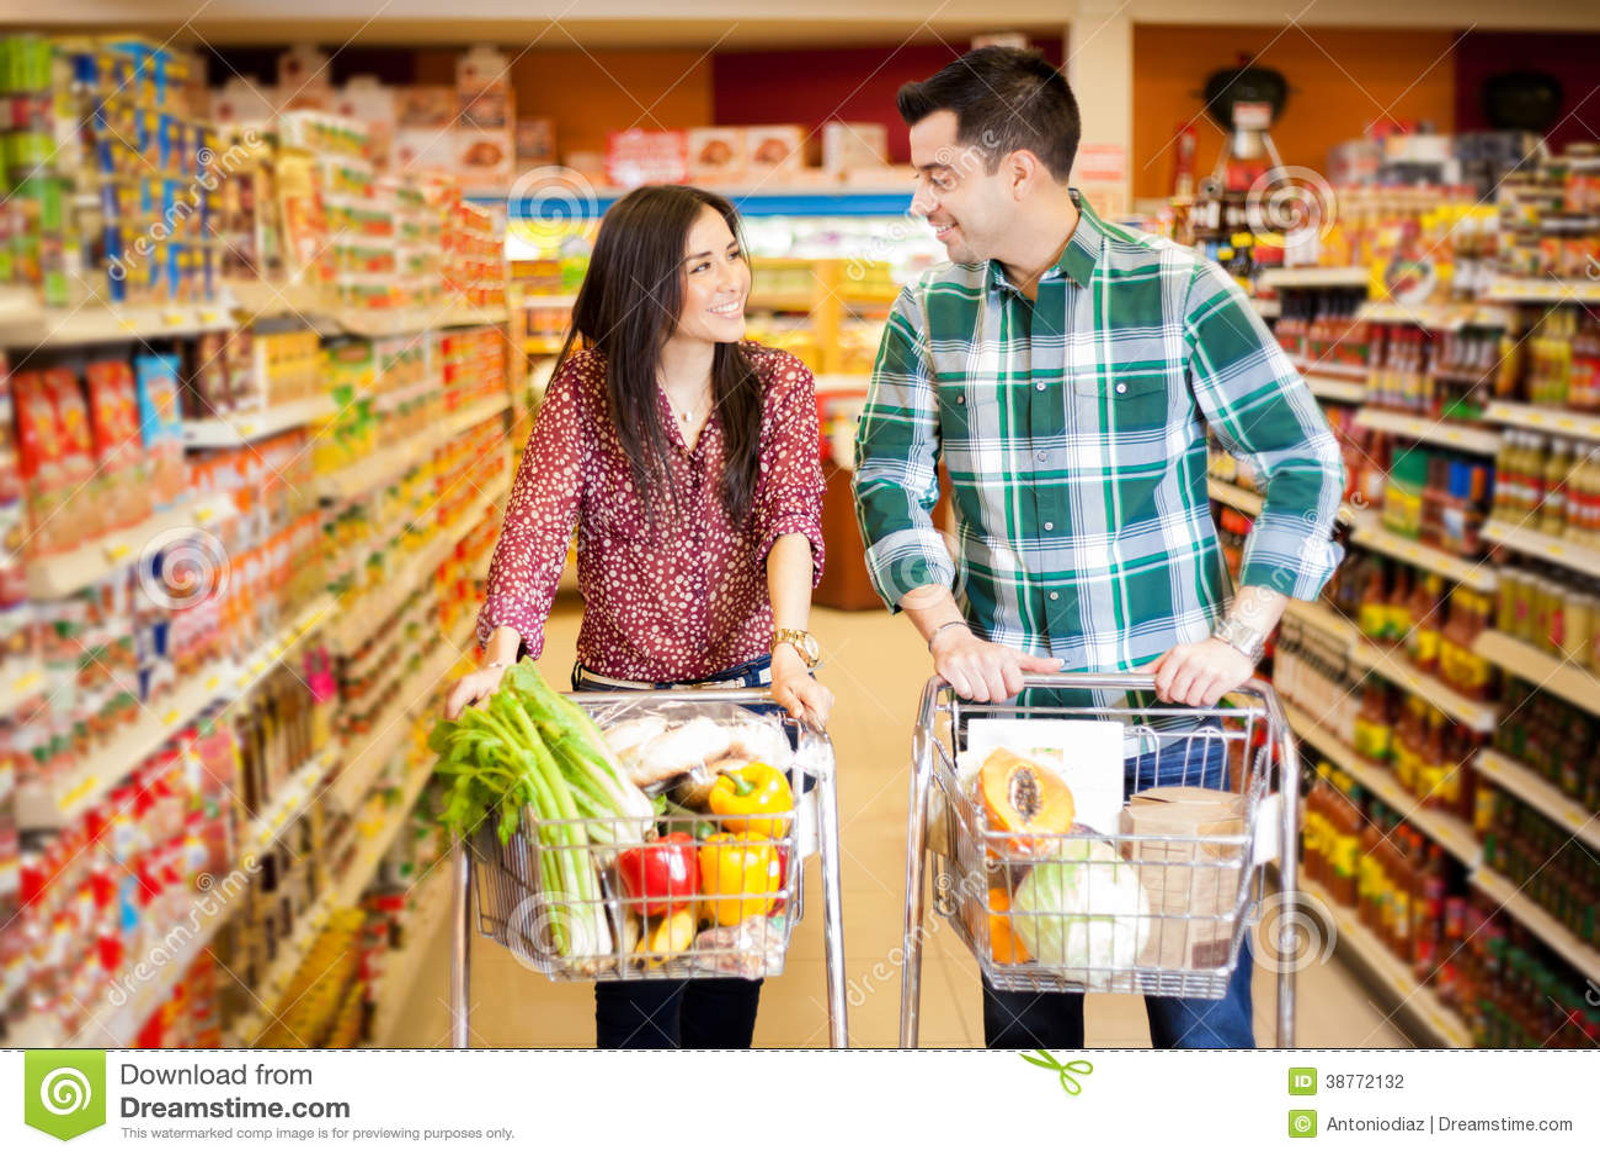 Flirting At The Supermarket Stock Photo - Image: 38772132